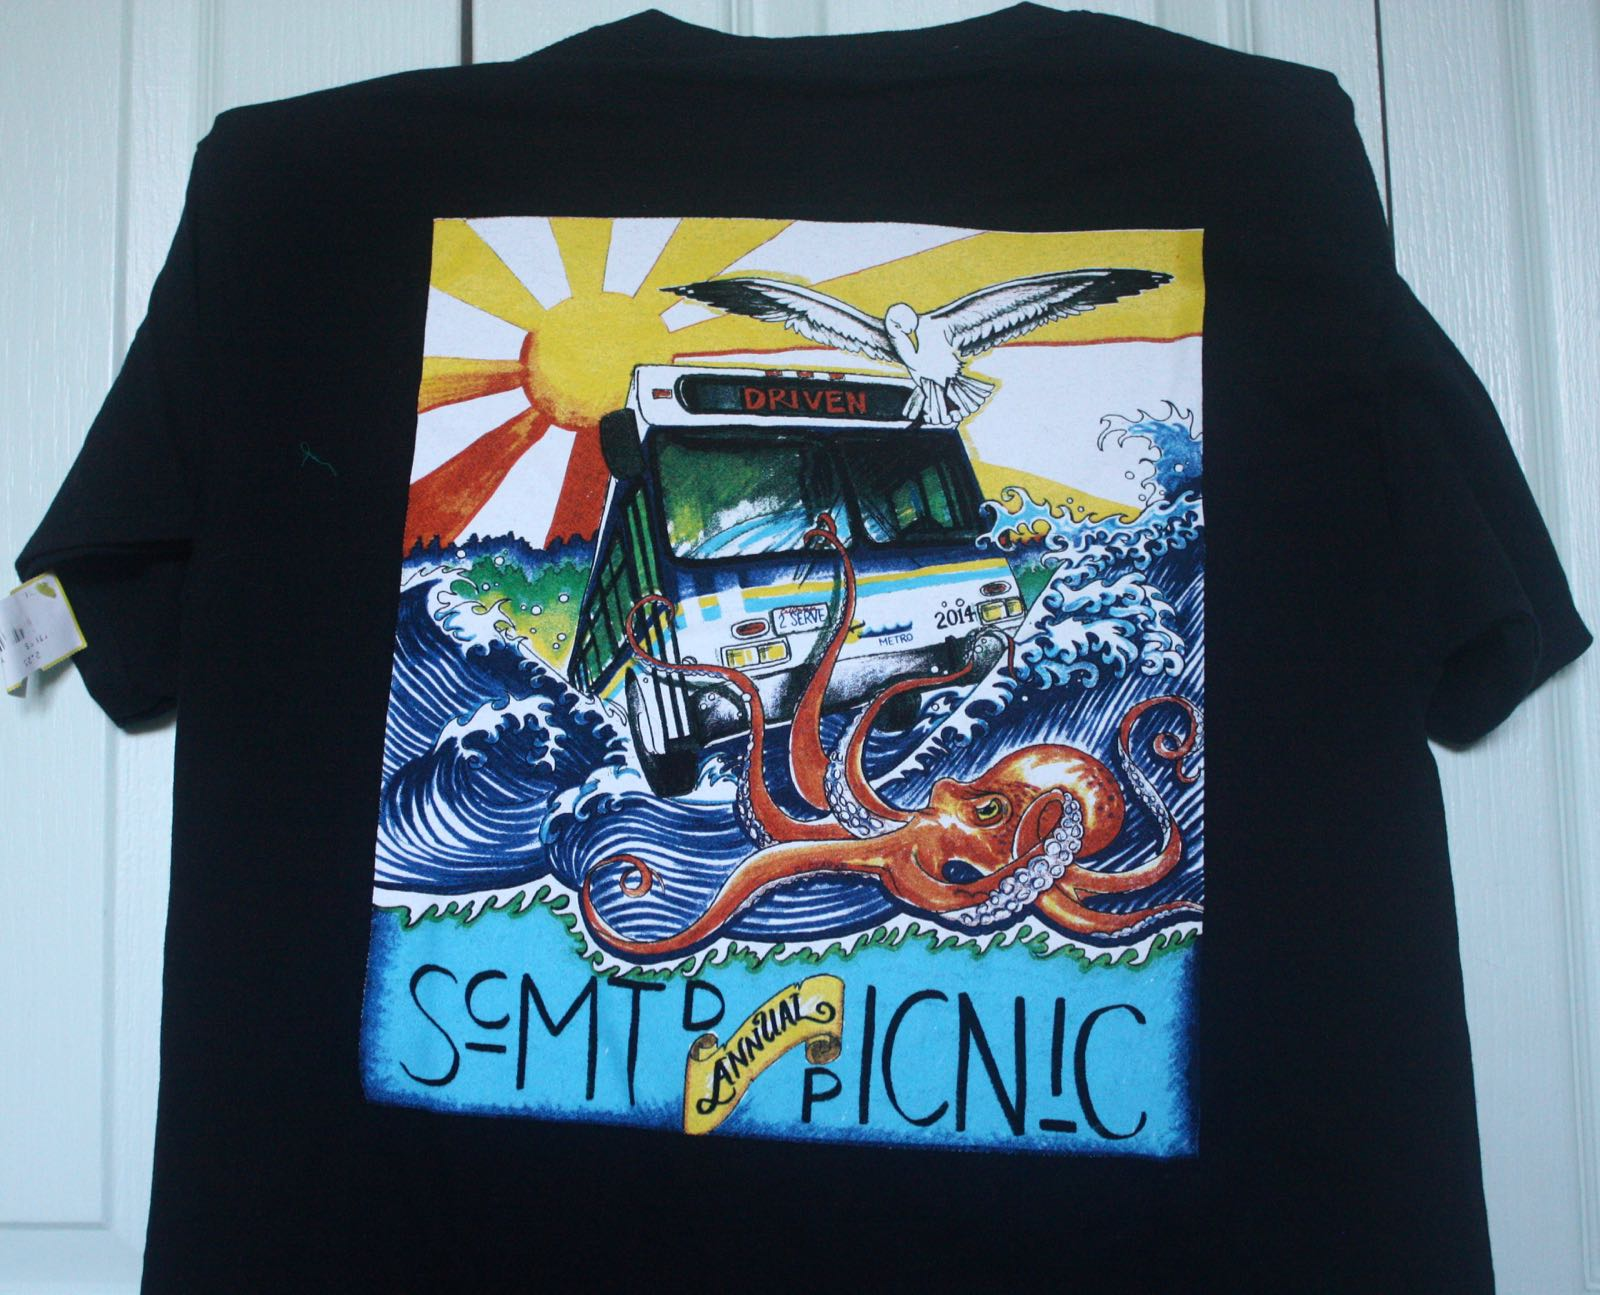 Santa Cruz Metro Surfing Bus Company Picnic Tee